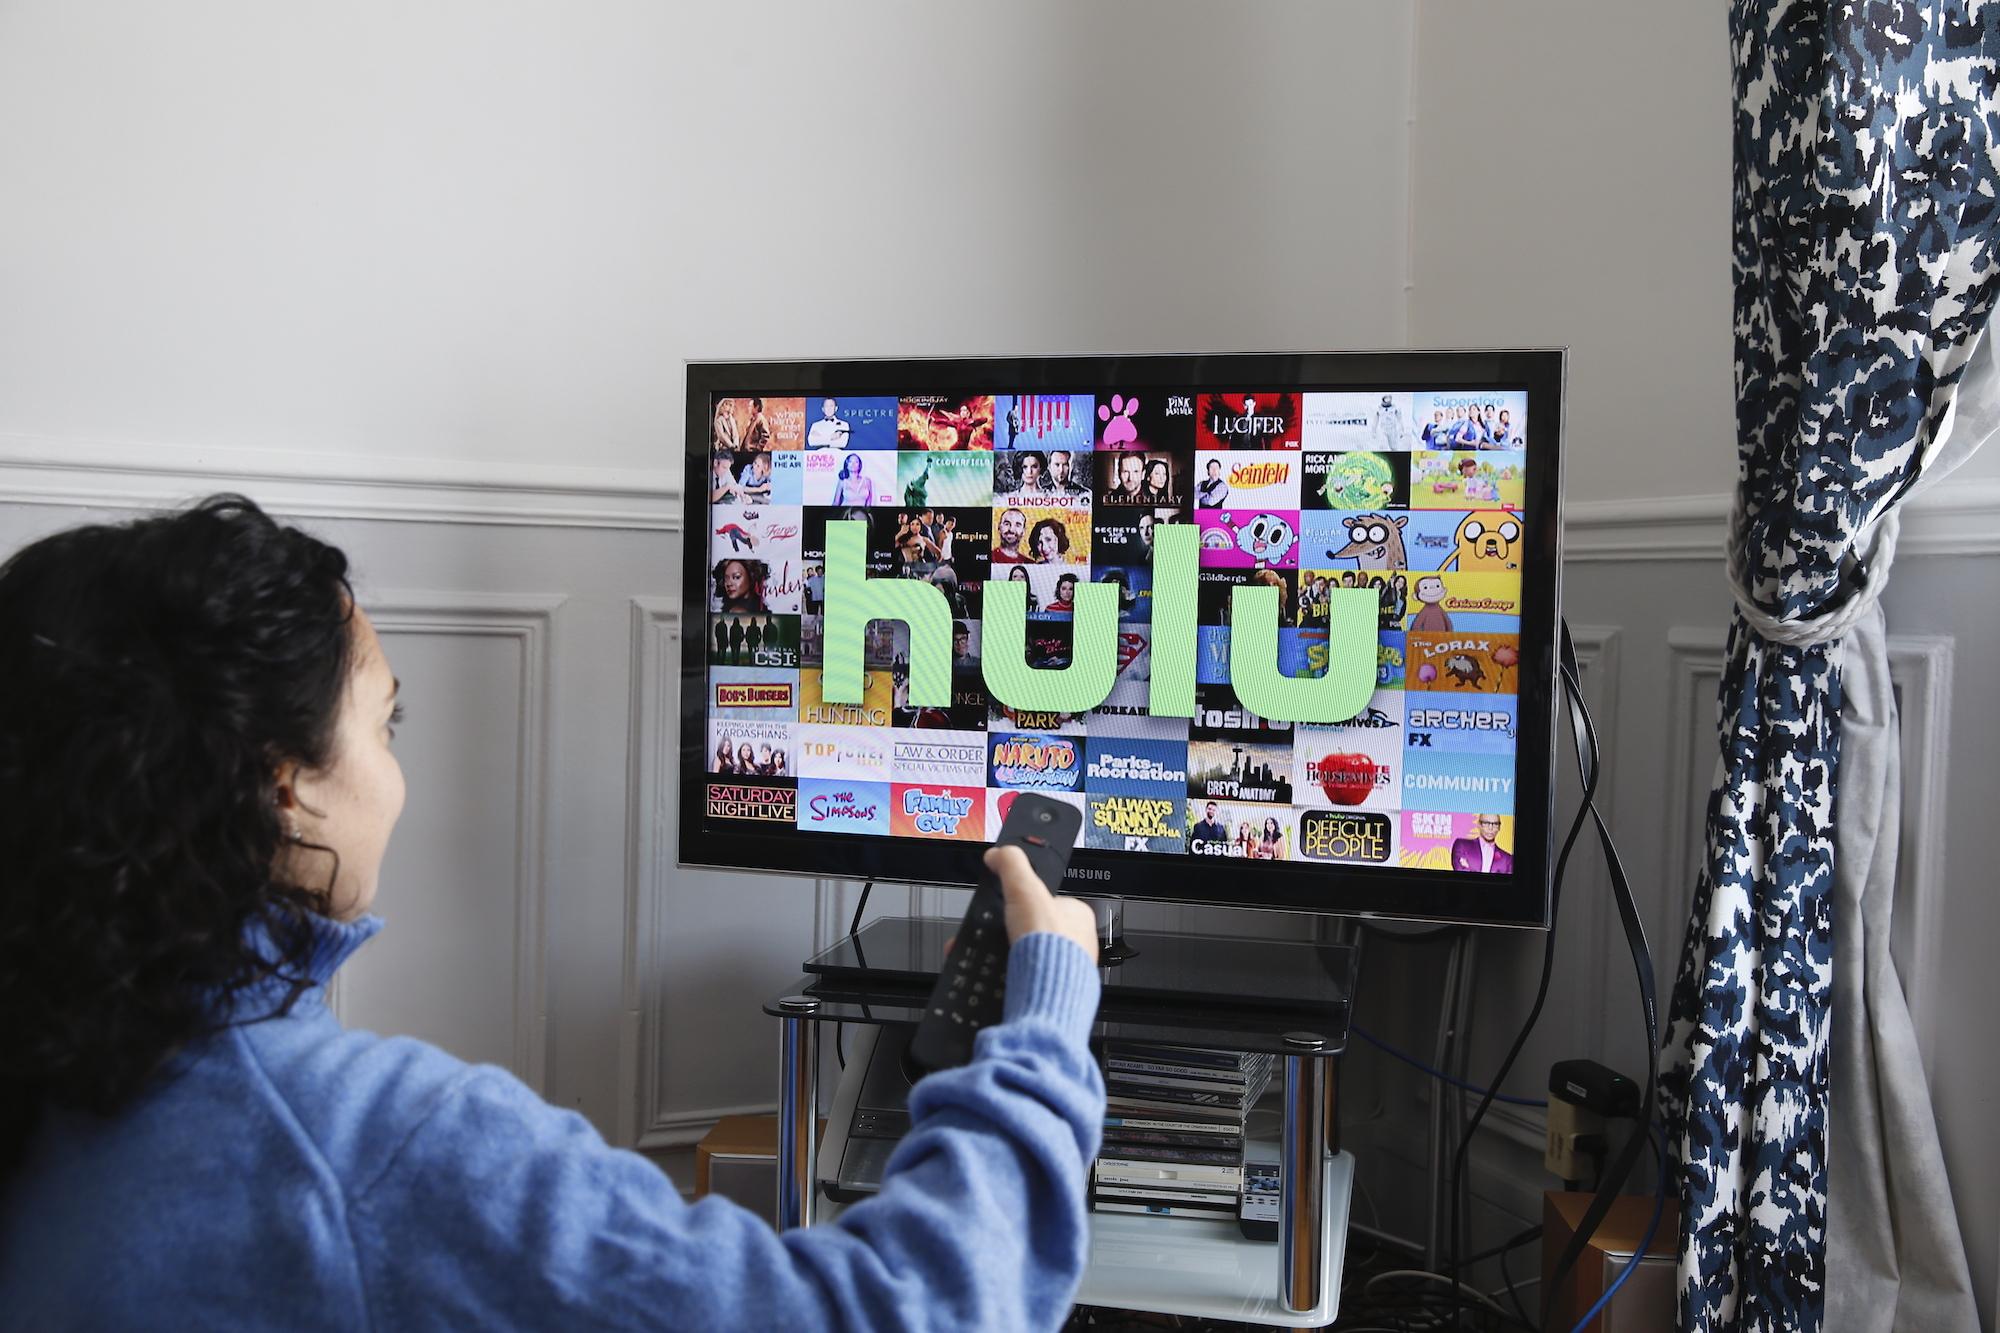 Photo illustration of Hulu logo on a TV, Nov. 20, 2019 in Paris, France